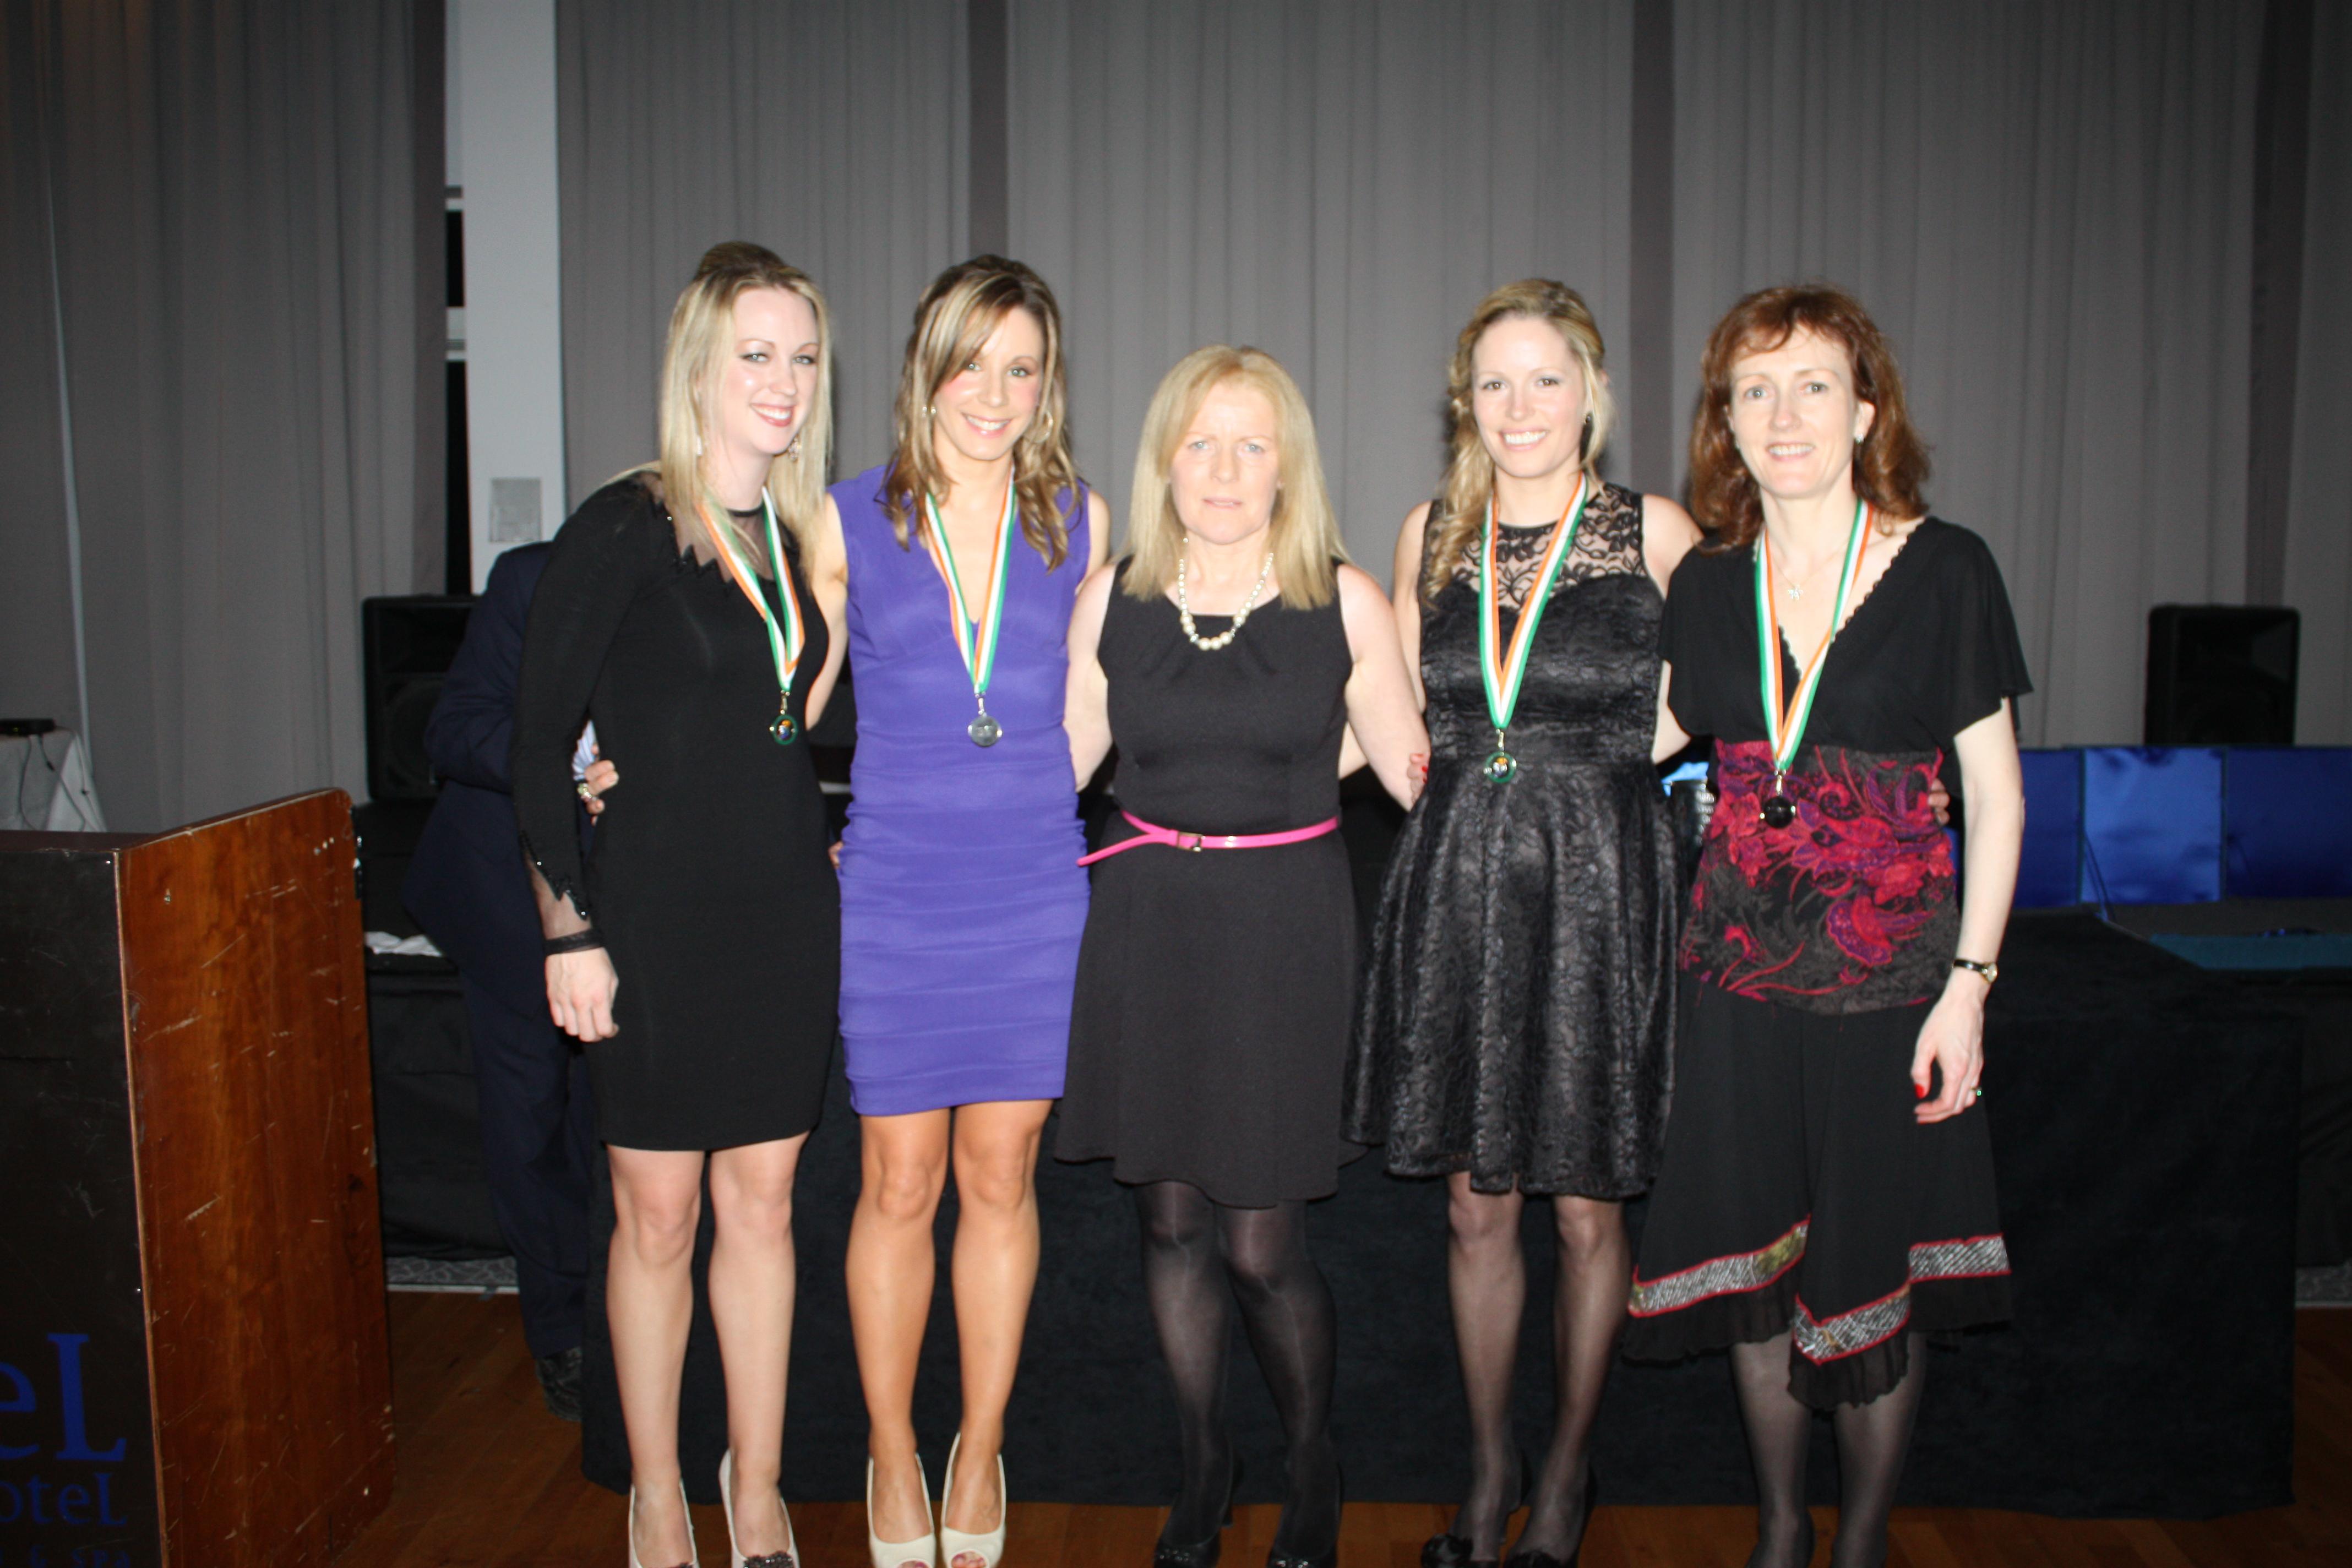 st-finbarrs-awards-night-2012-004